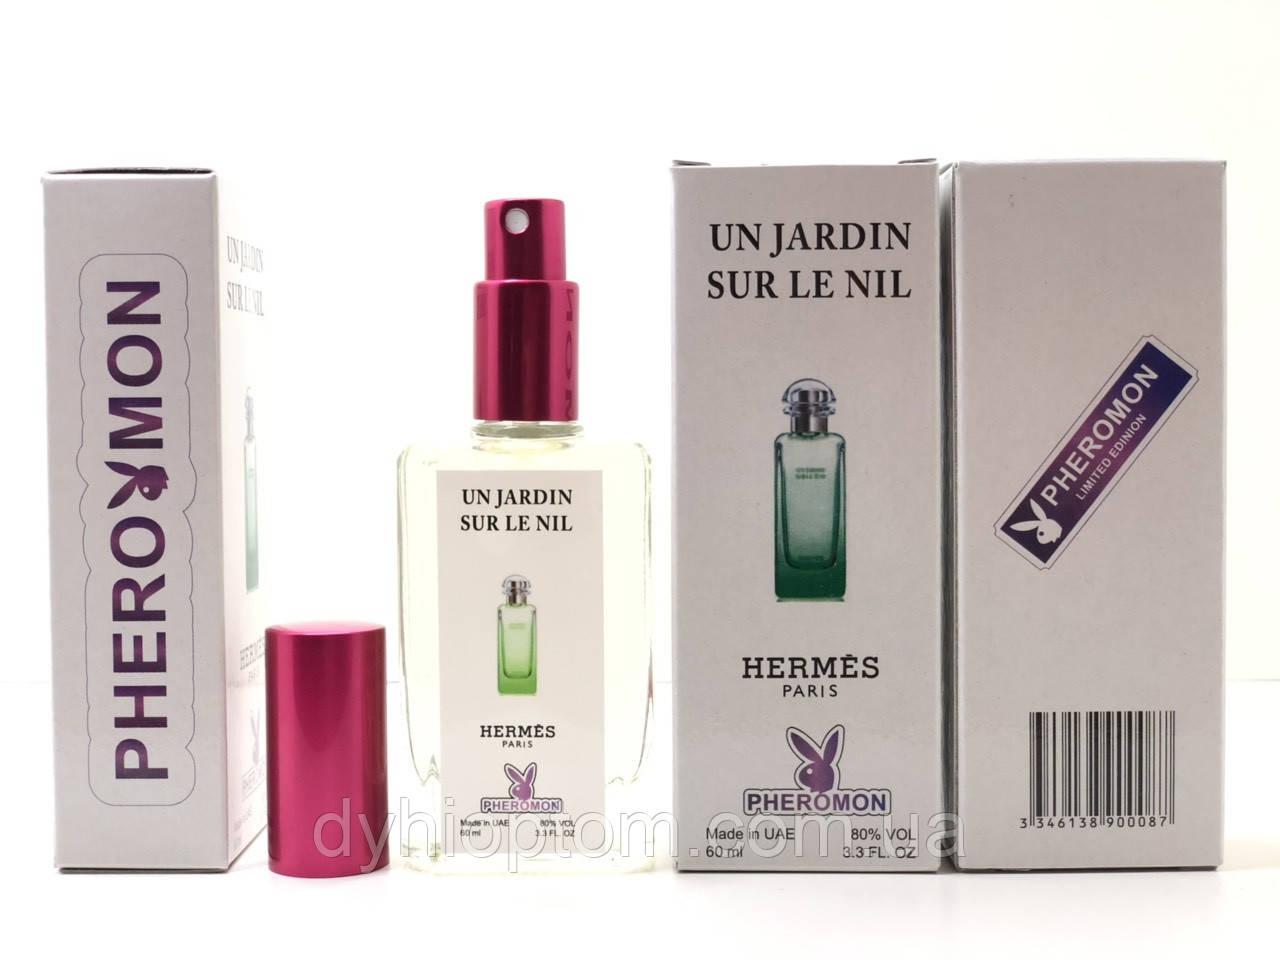 Женский парфюм Hermes Un Jardin sur le Nil, 60 ml